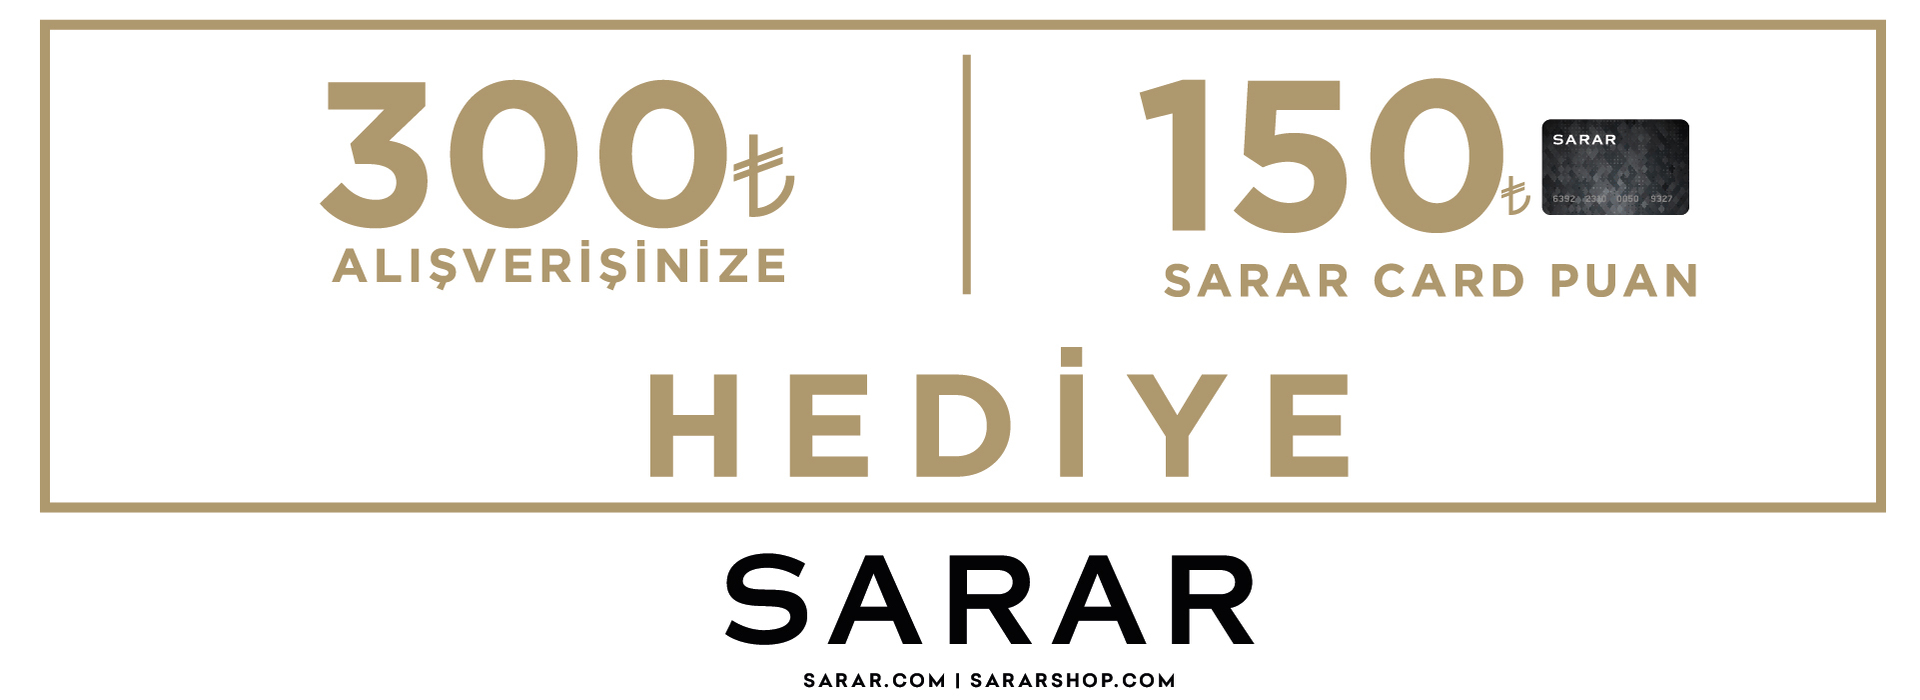 Sarar - 300 TL Alışverişinize 150 TL Sarar Card Puan Hediye